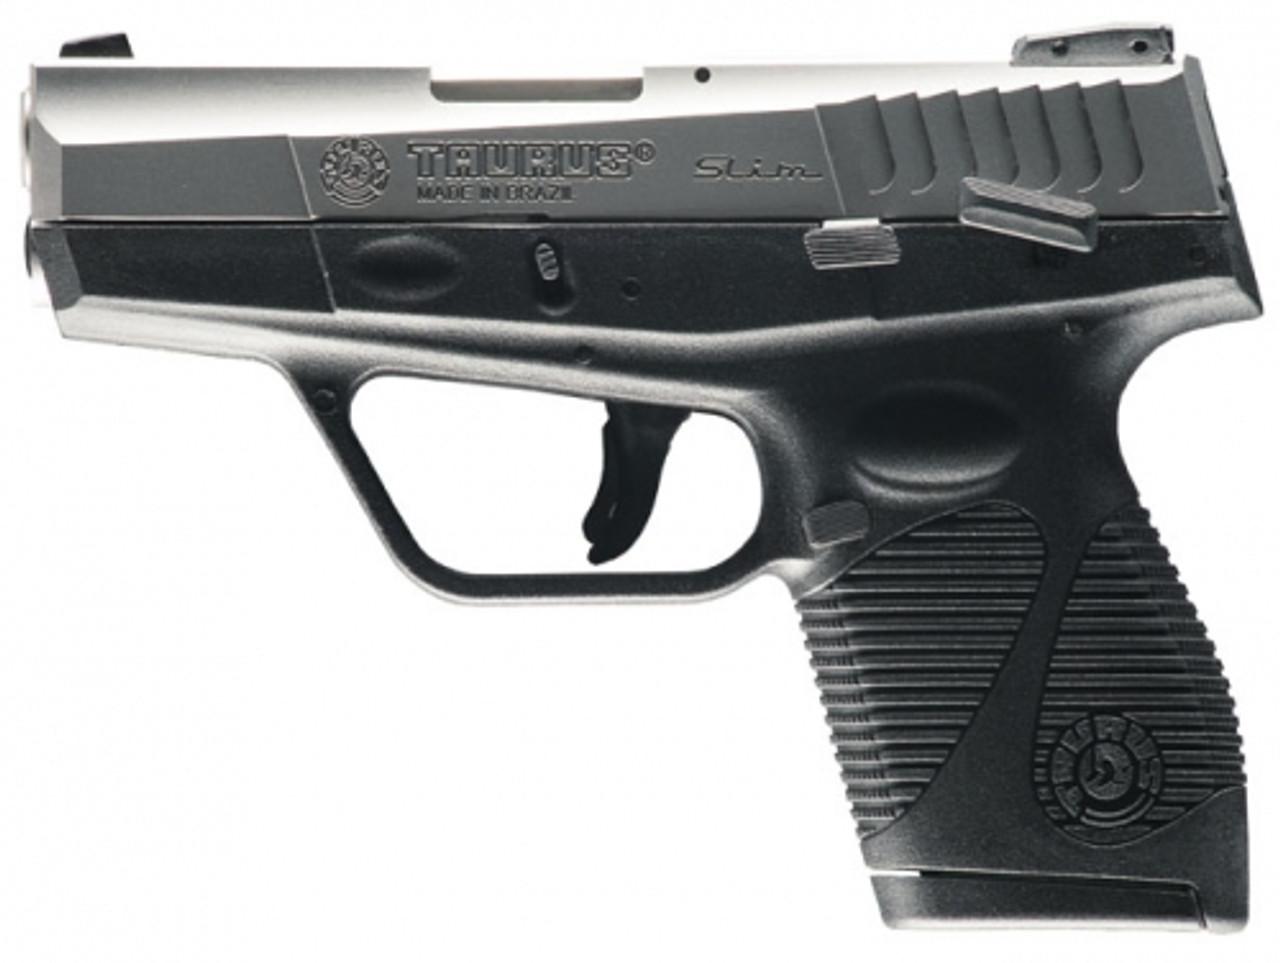 Taurus PT-740 Slim 40 S&W - 1-740039